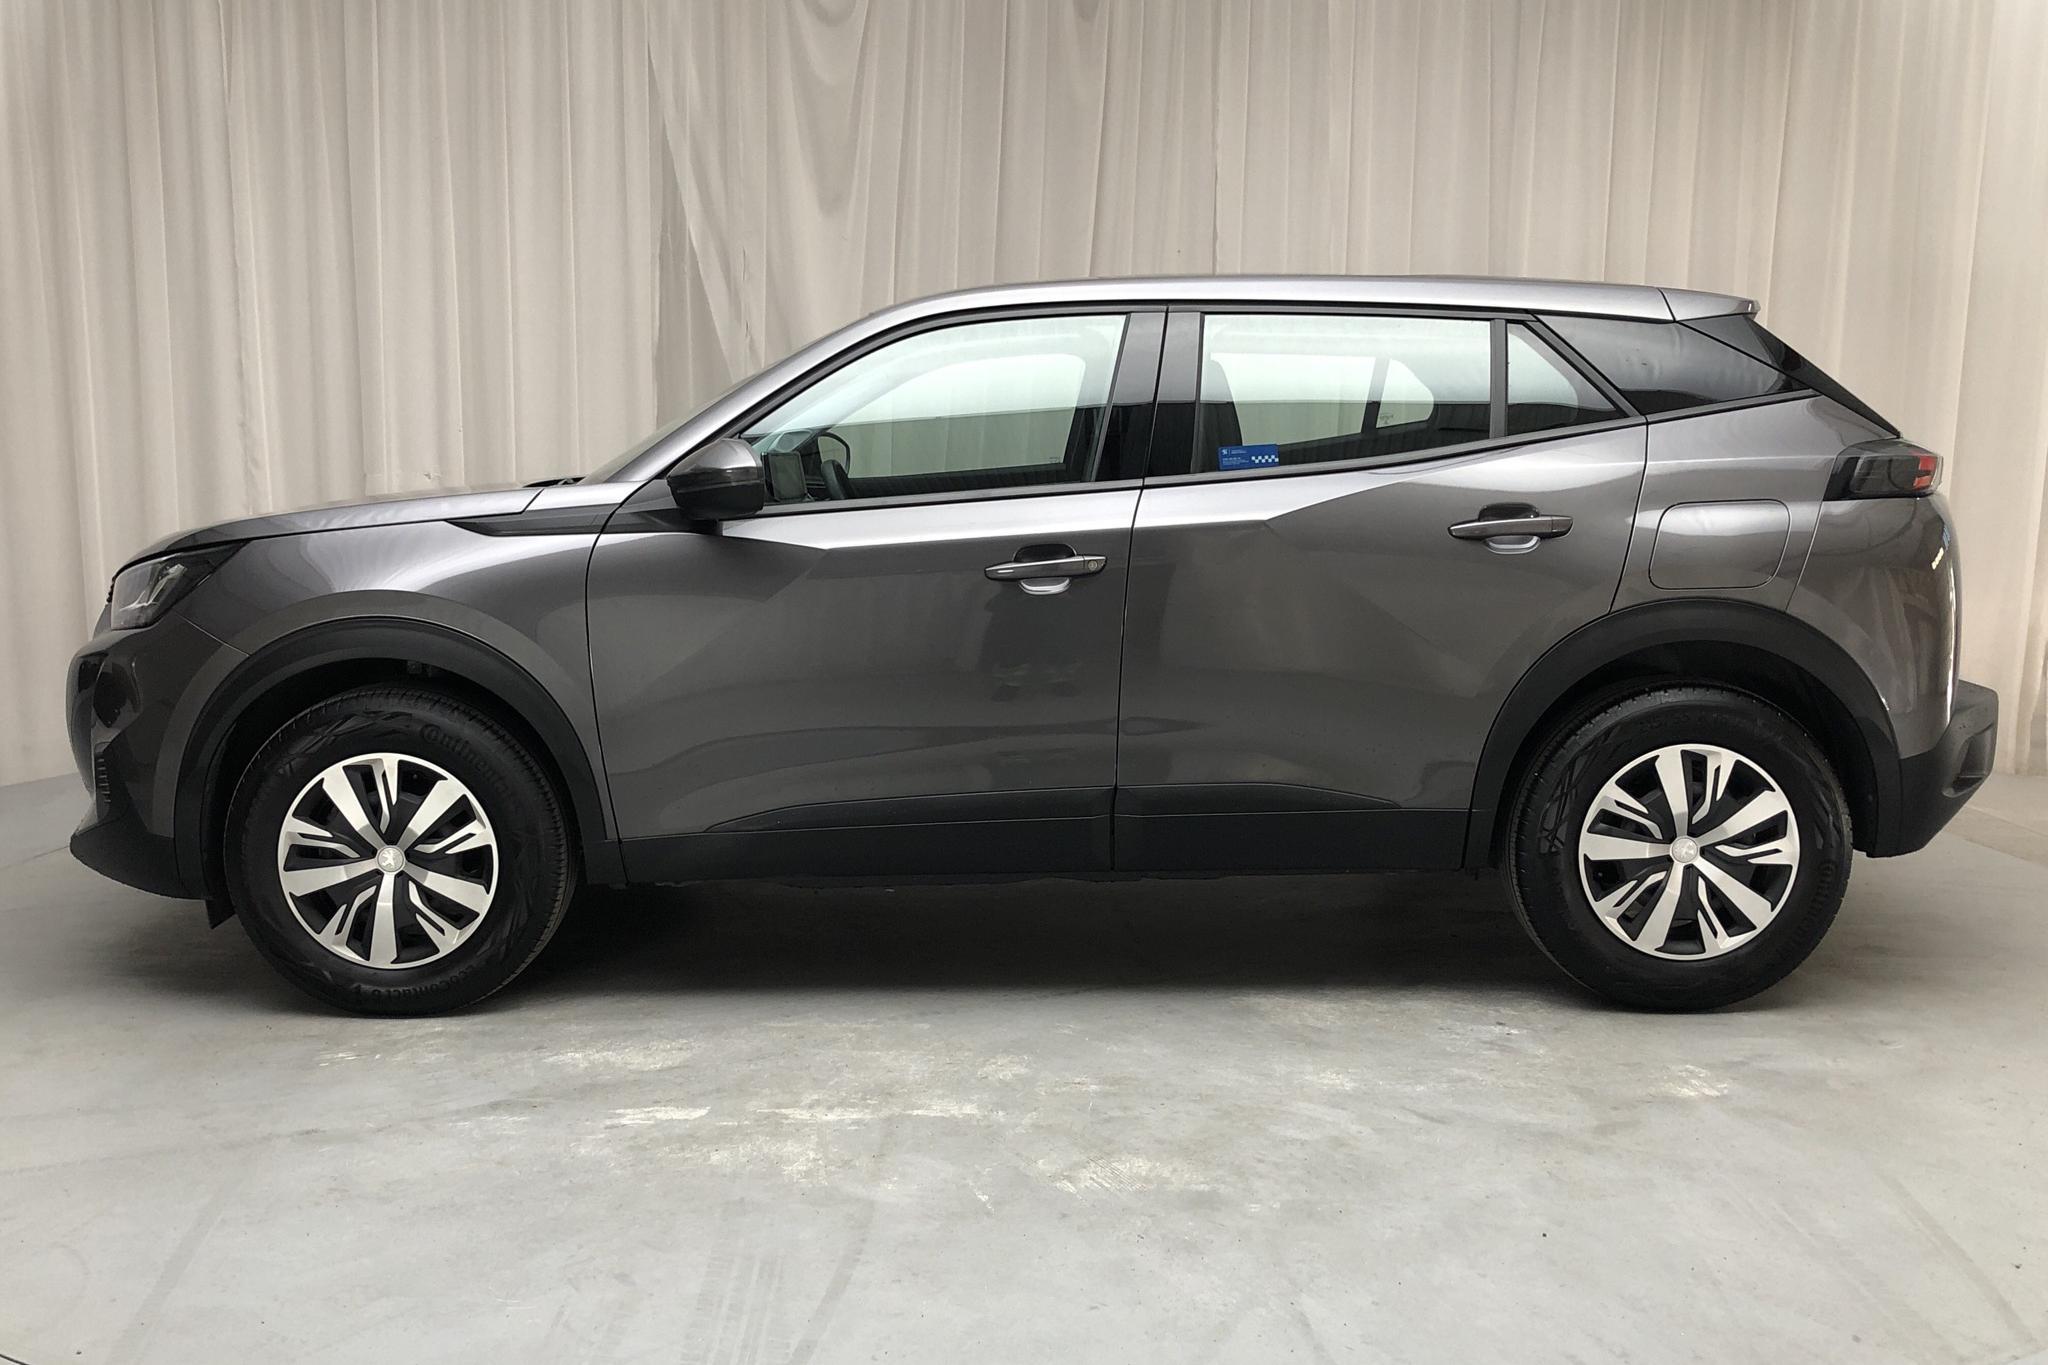 Peugeot 2008 PureTech (100hk) - 17 430 km - Manual - gray - 2020